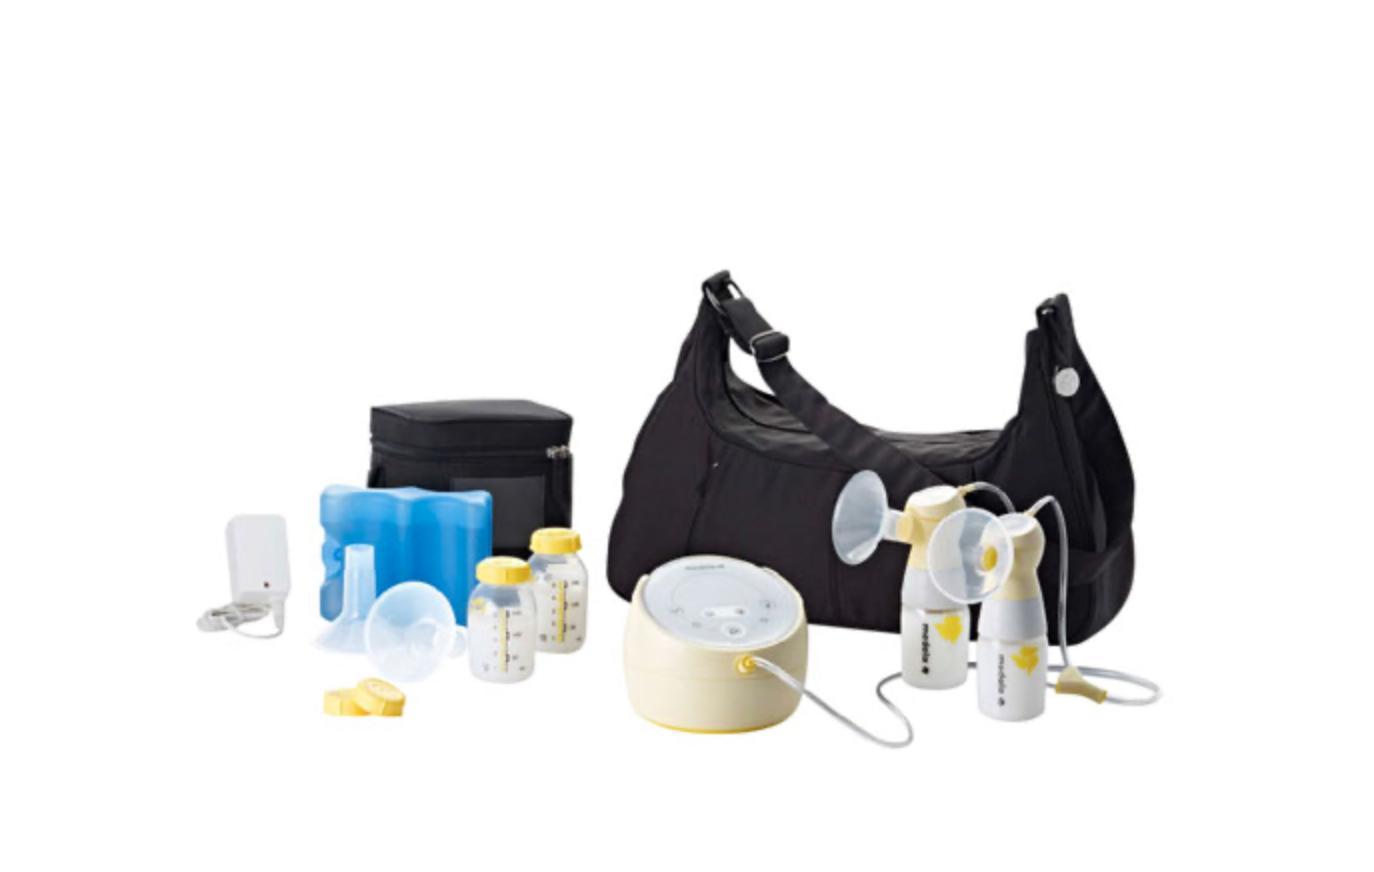 medela sonata breast pump